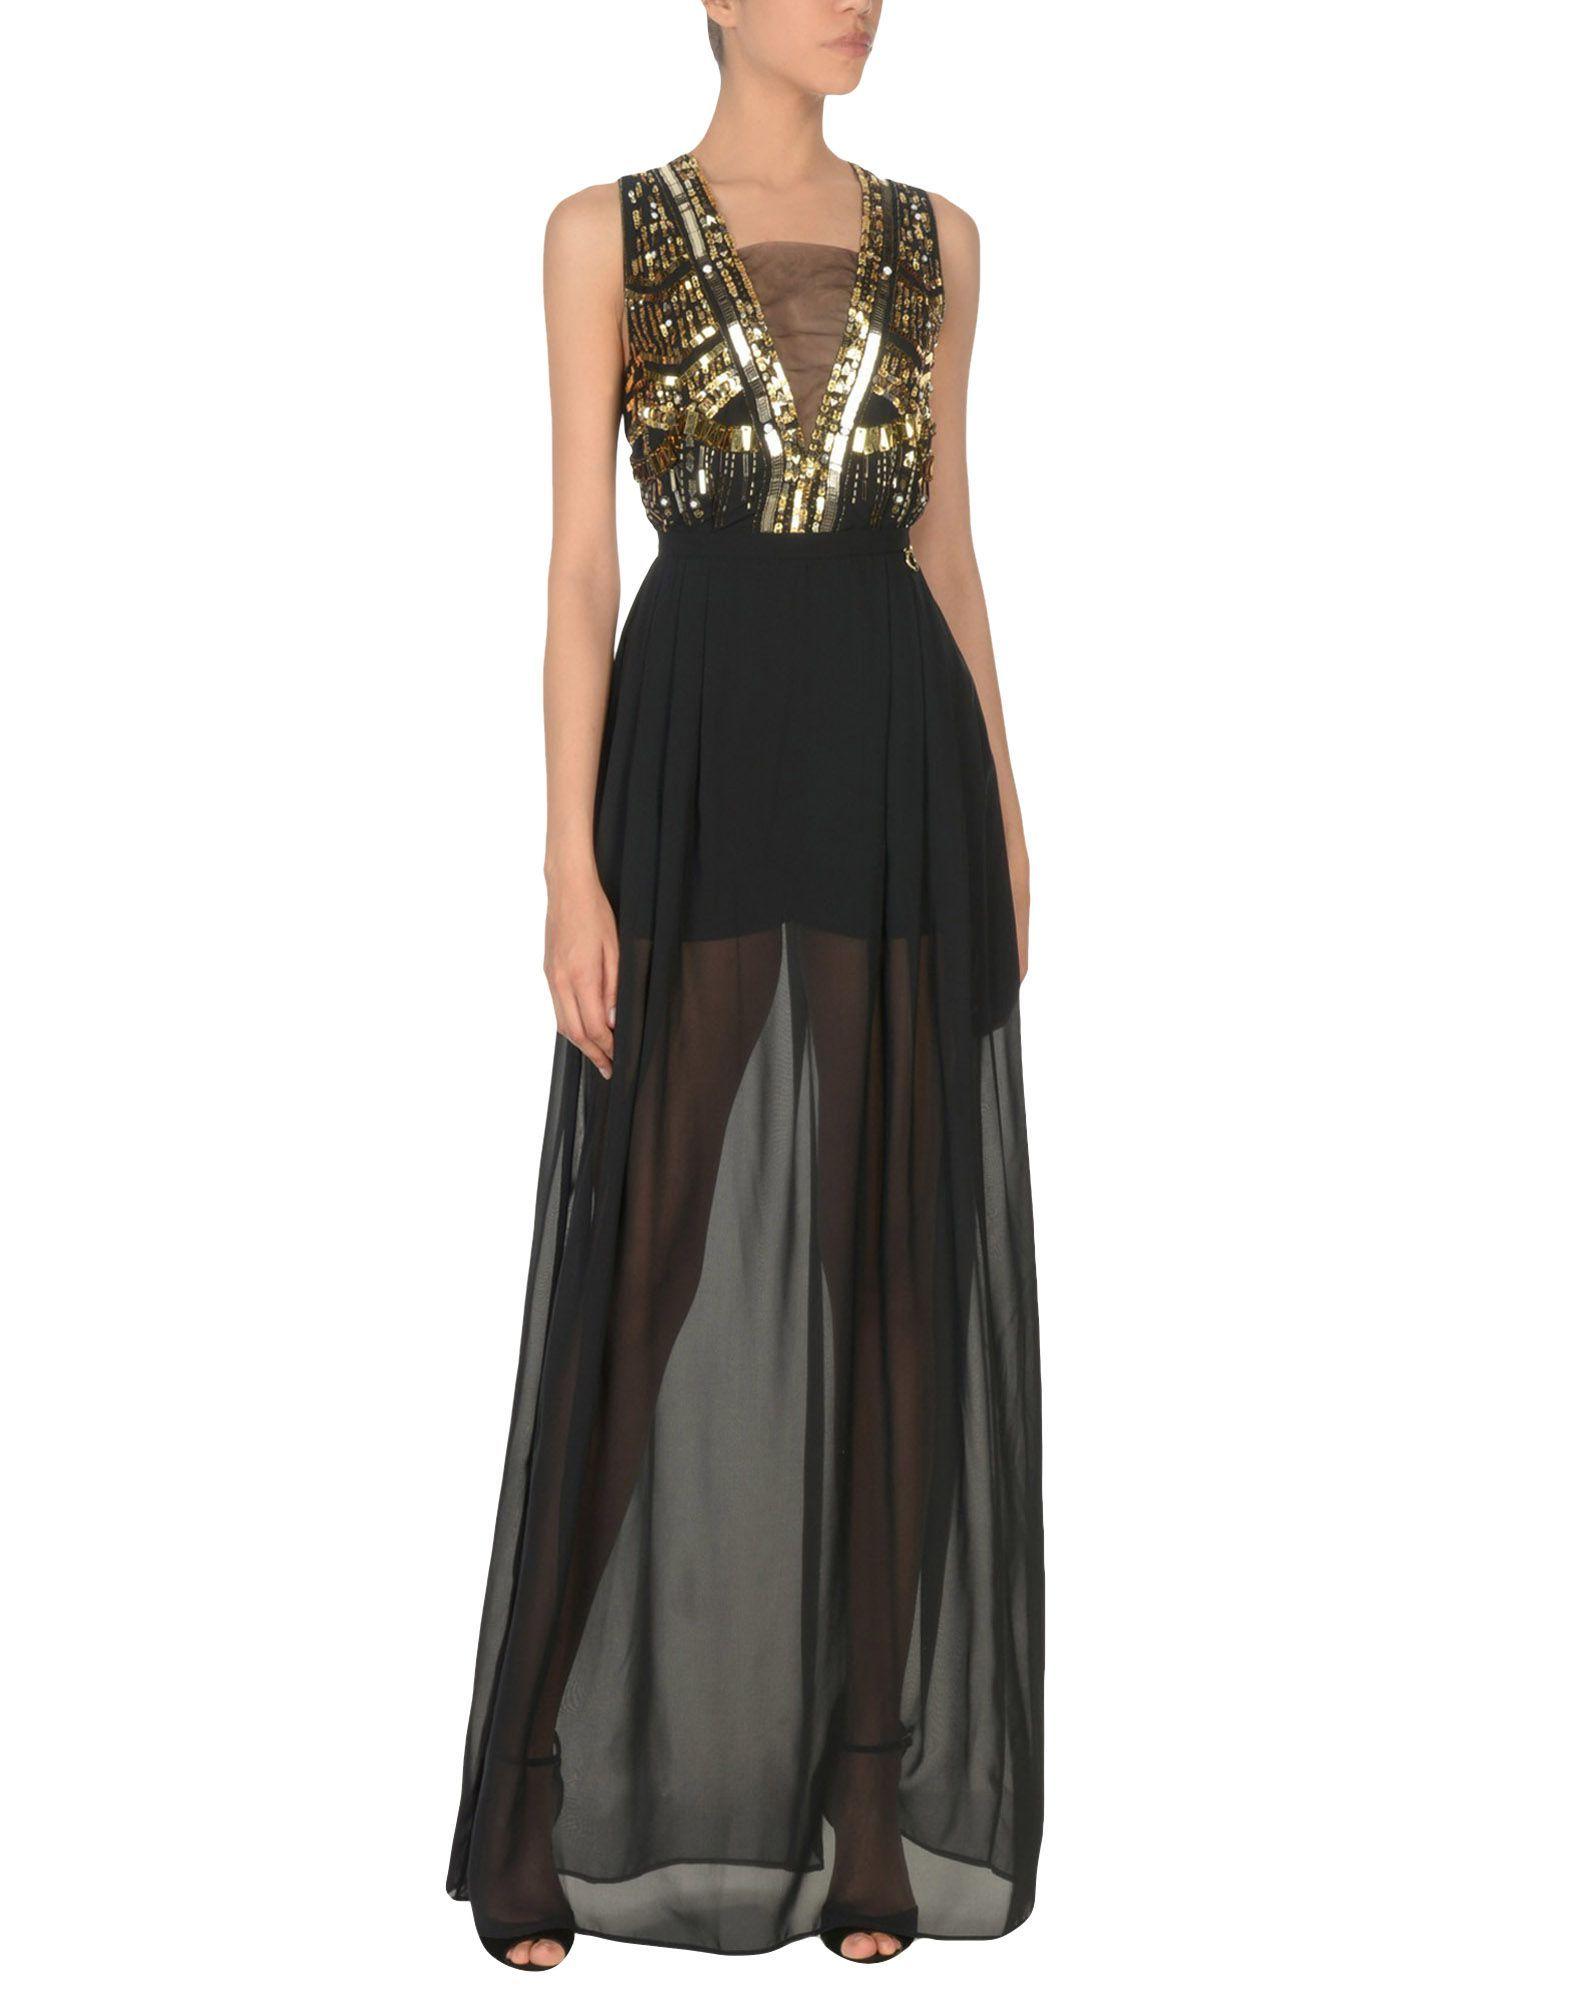 Mangano Black Chiffon Full Length Dress